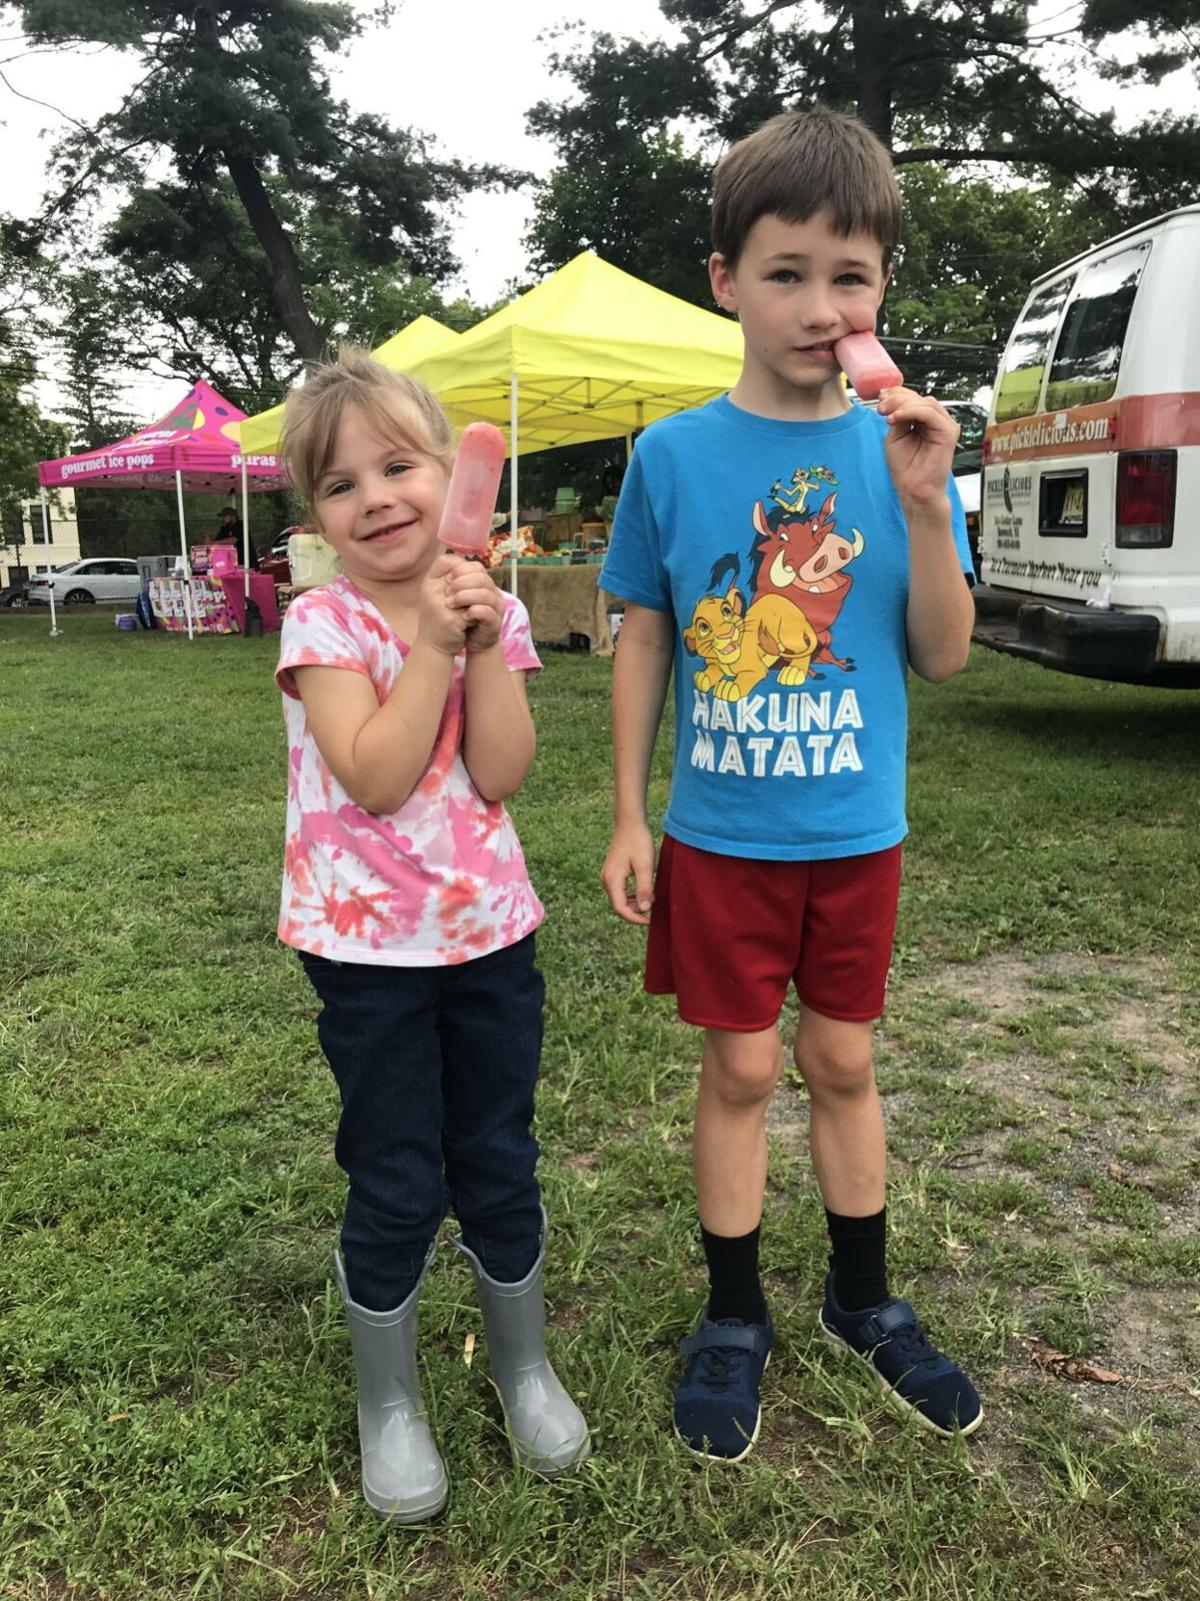 A 'festival feel' at Madison Farmers Market